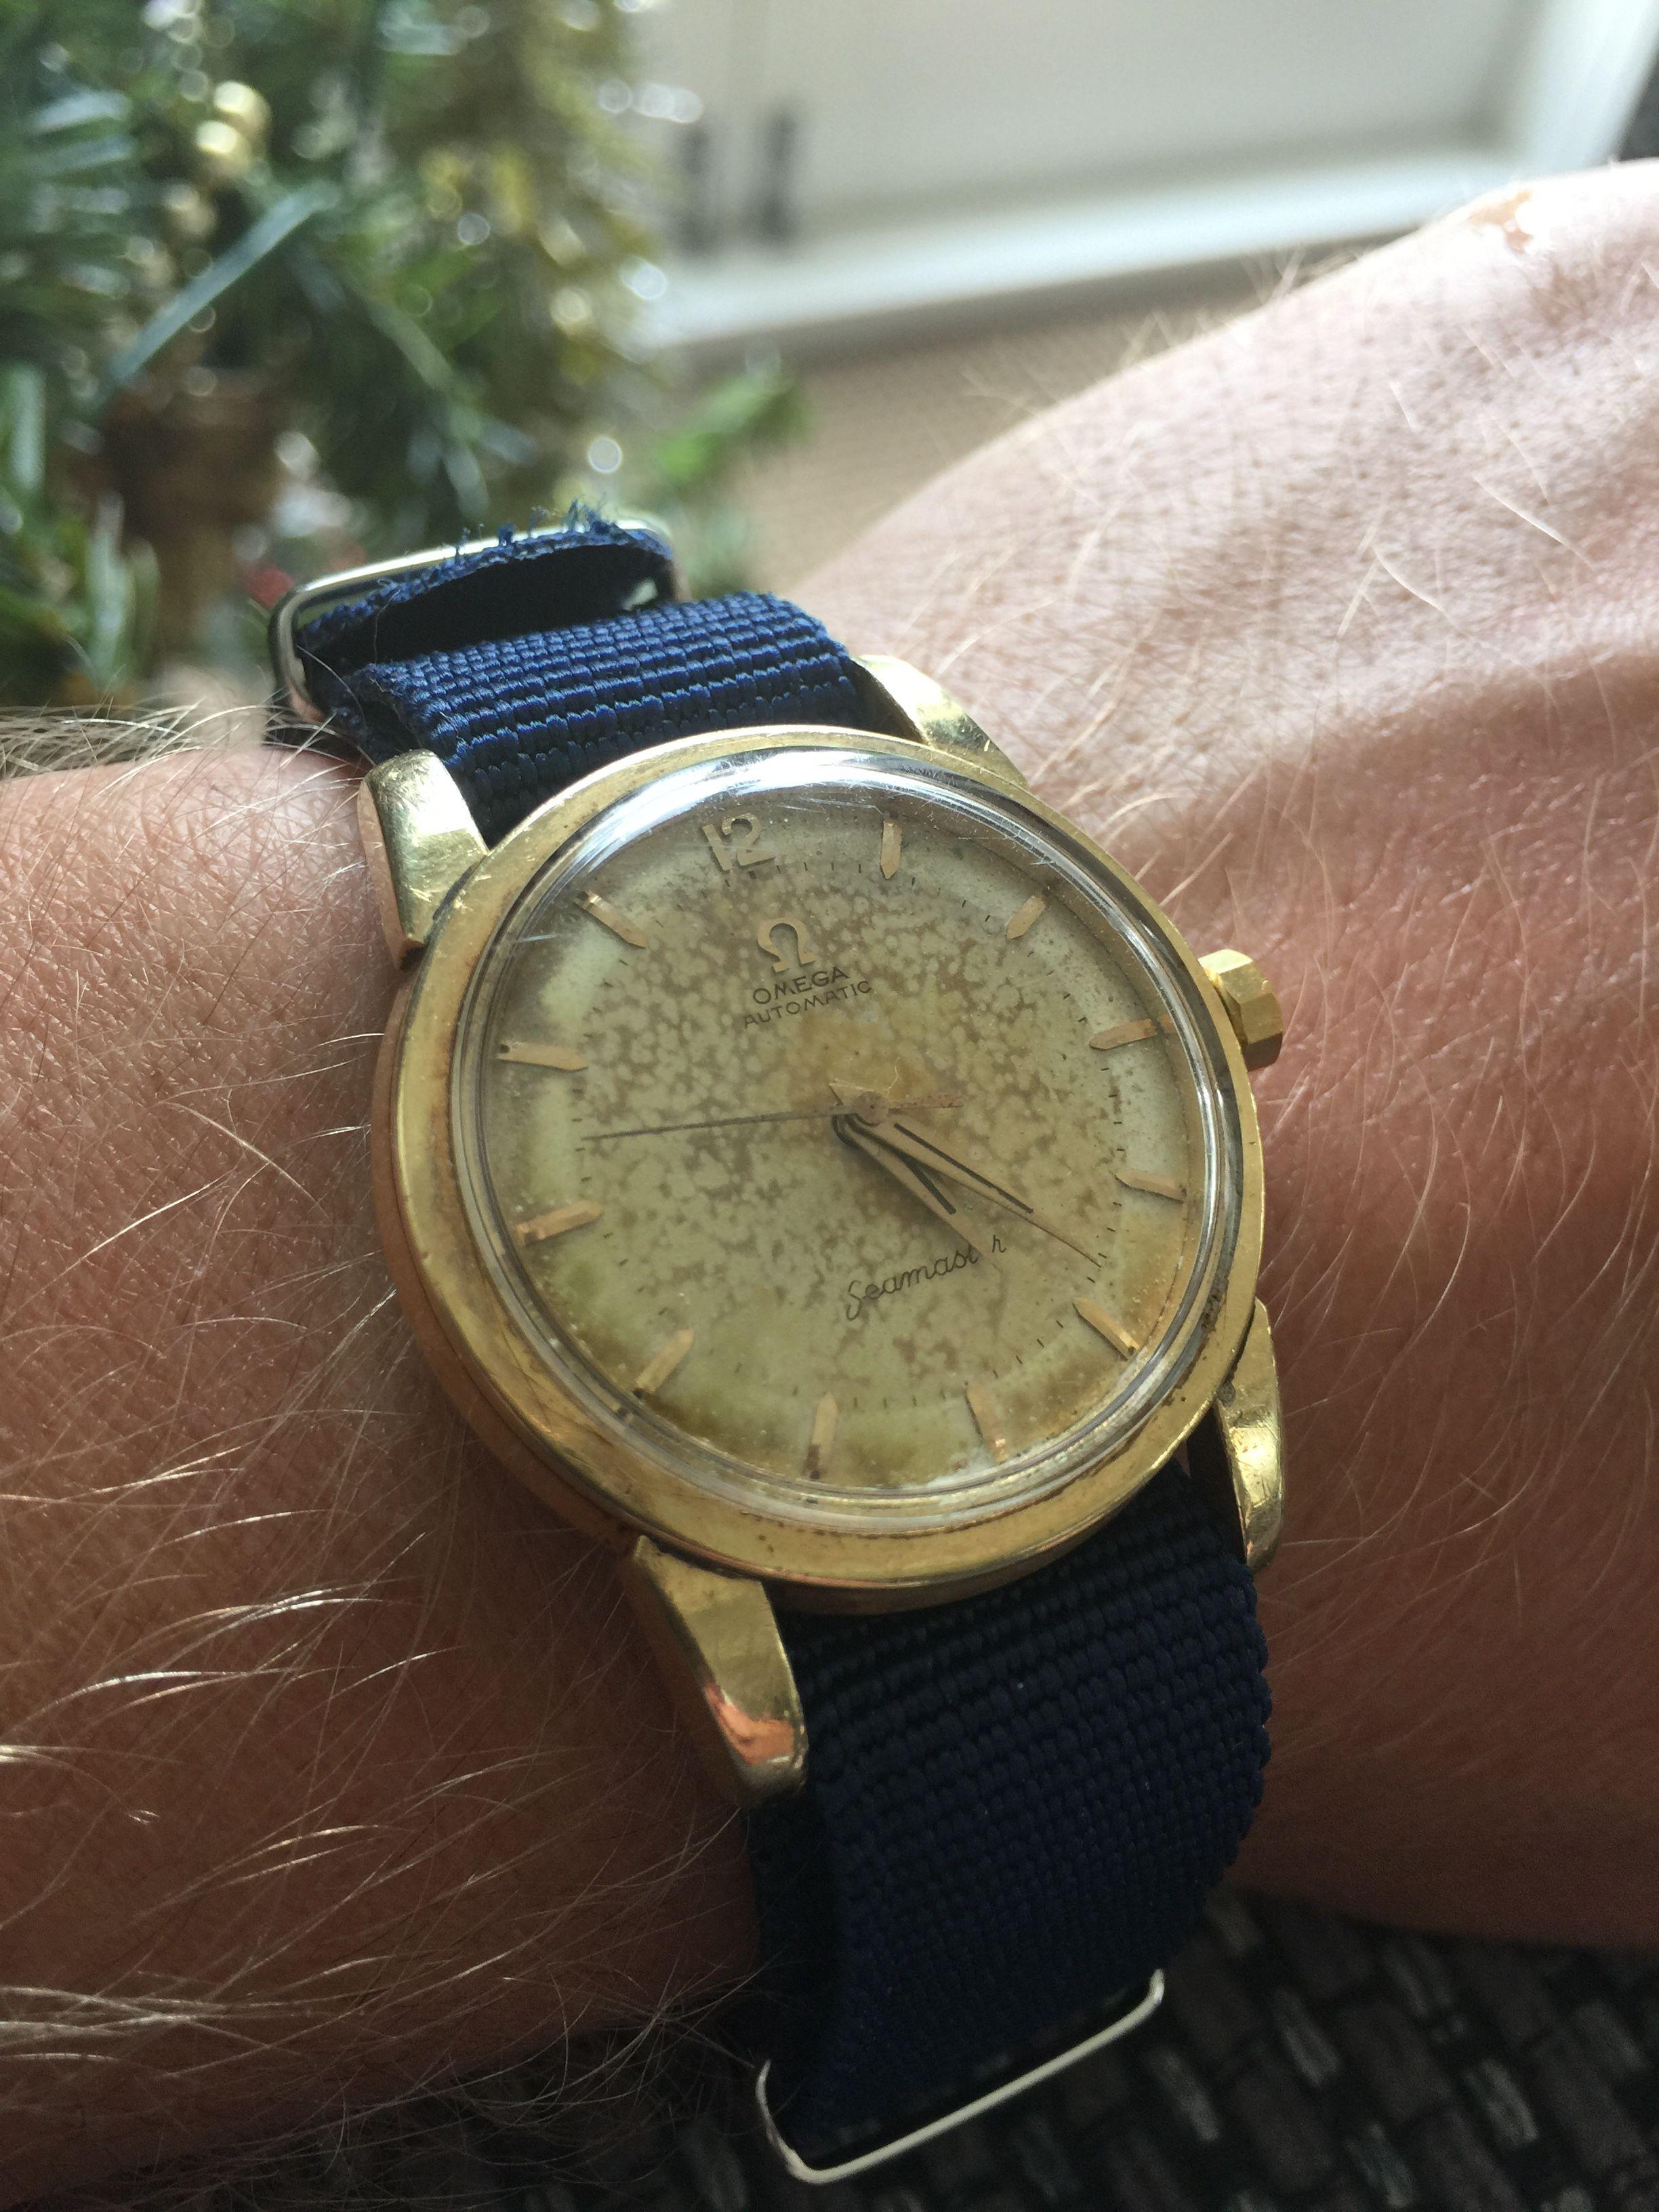 Omega vintage watch wrist